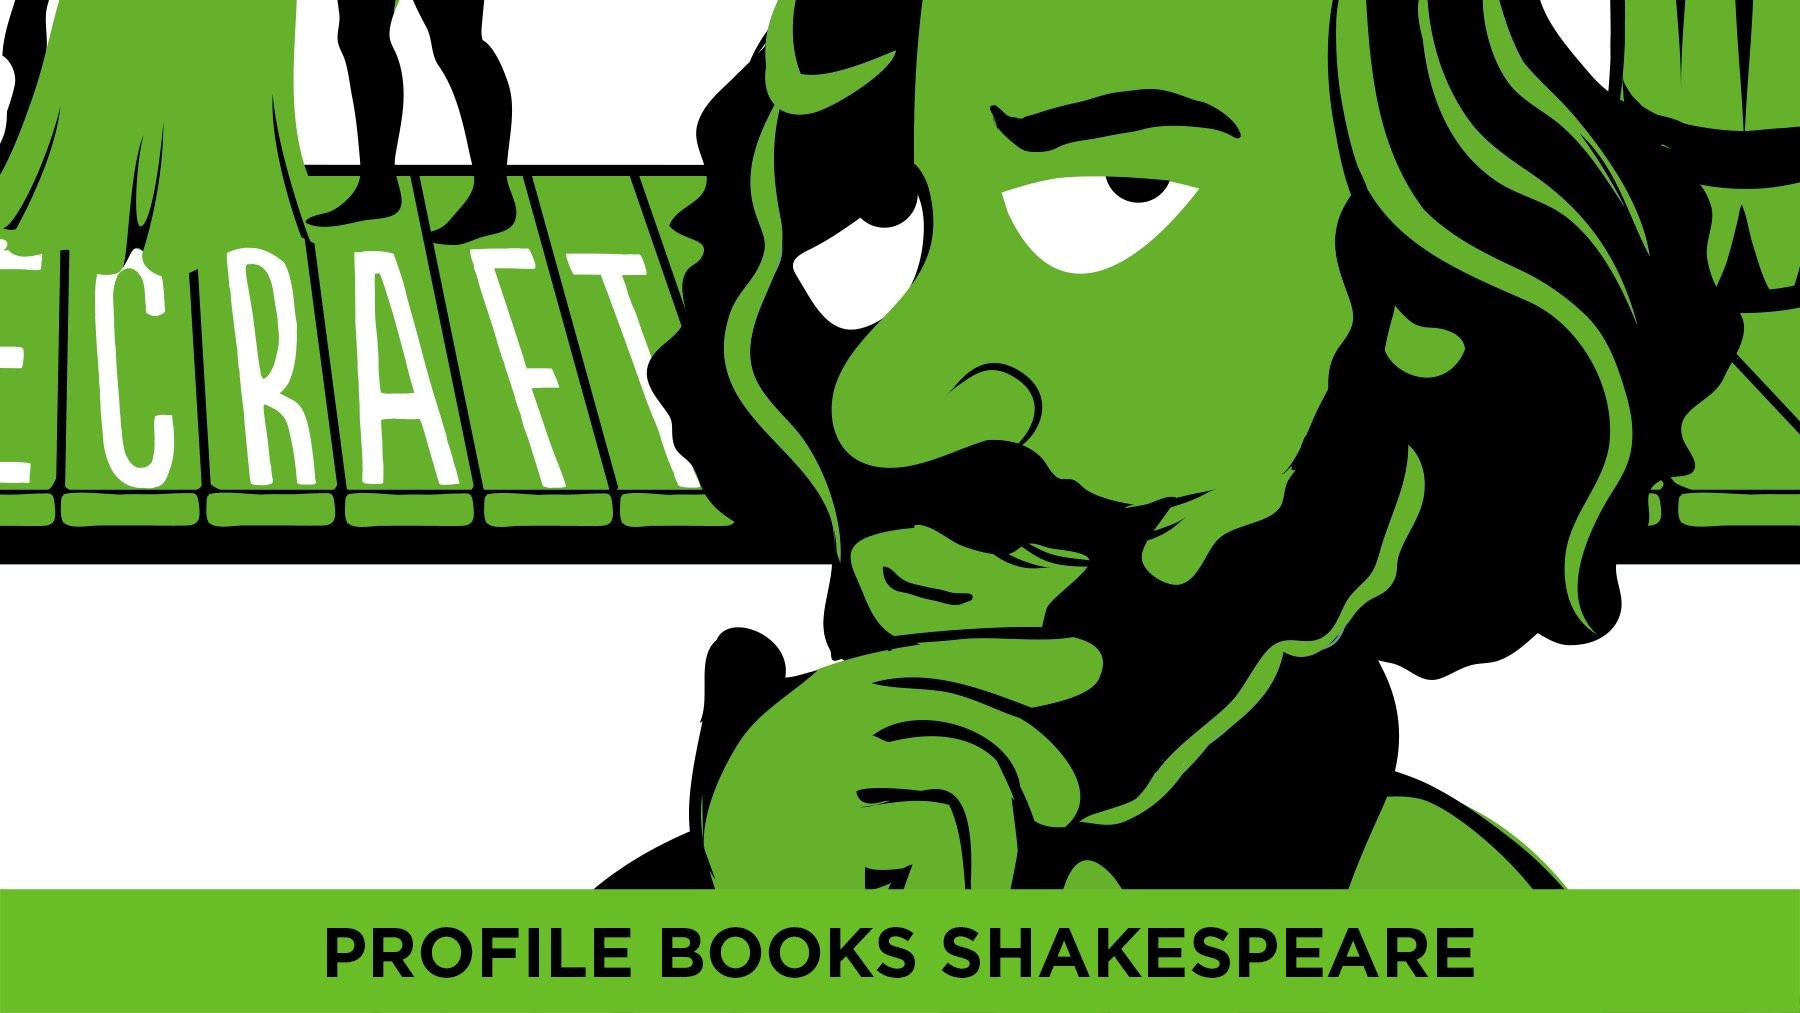 profile-books-shakespeare-illustration-cognitive-01.jpg